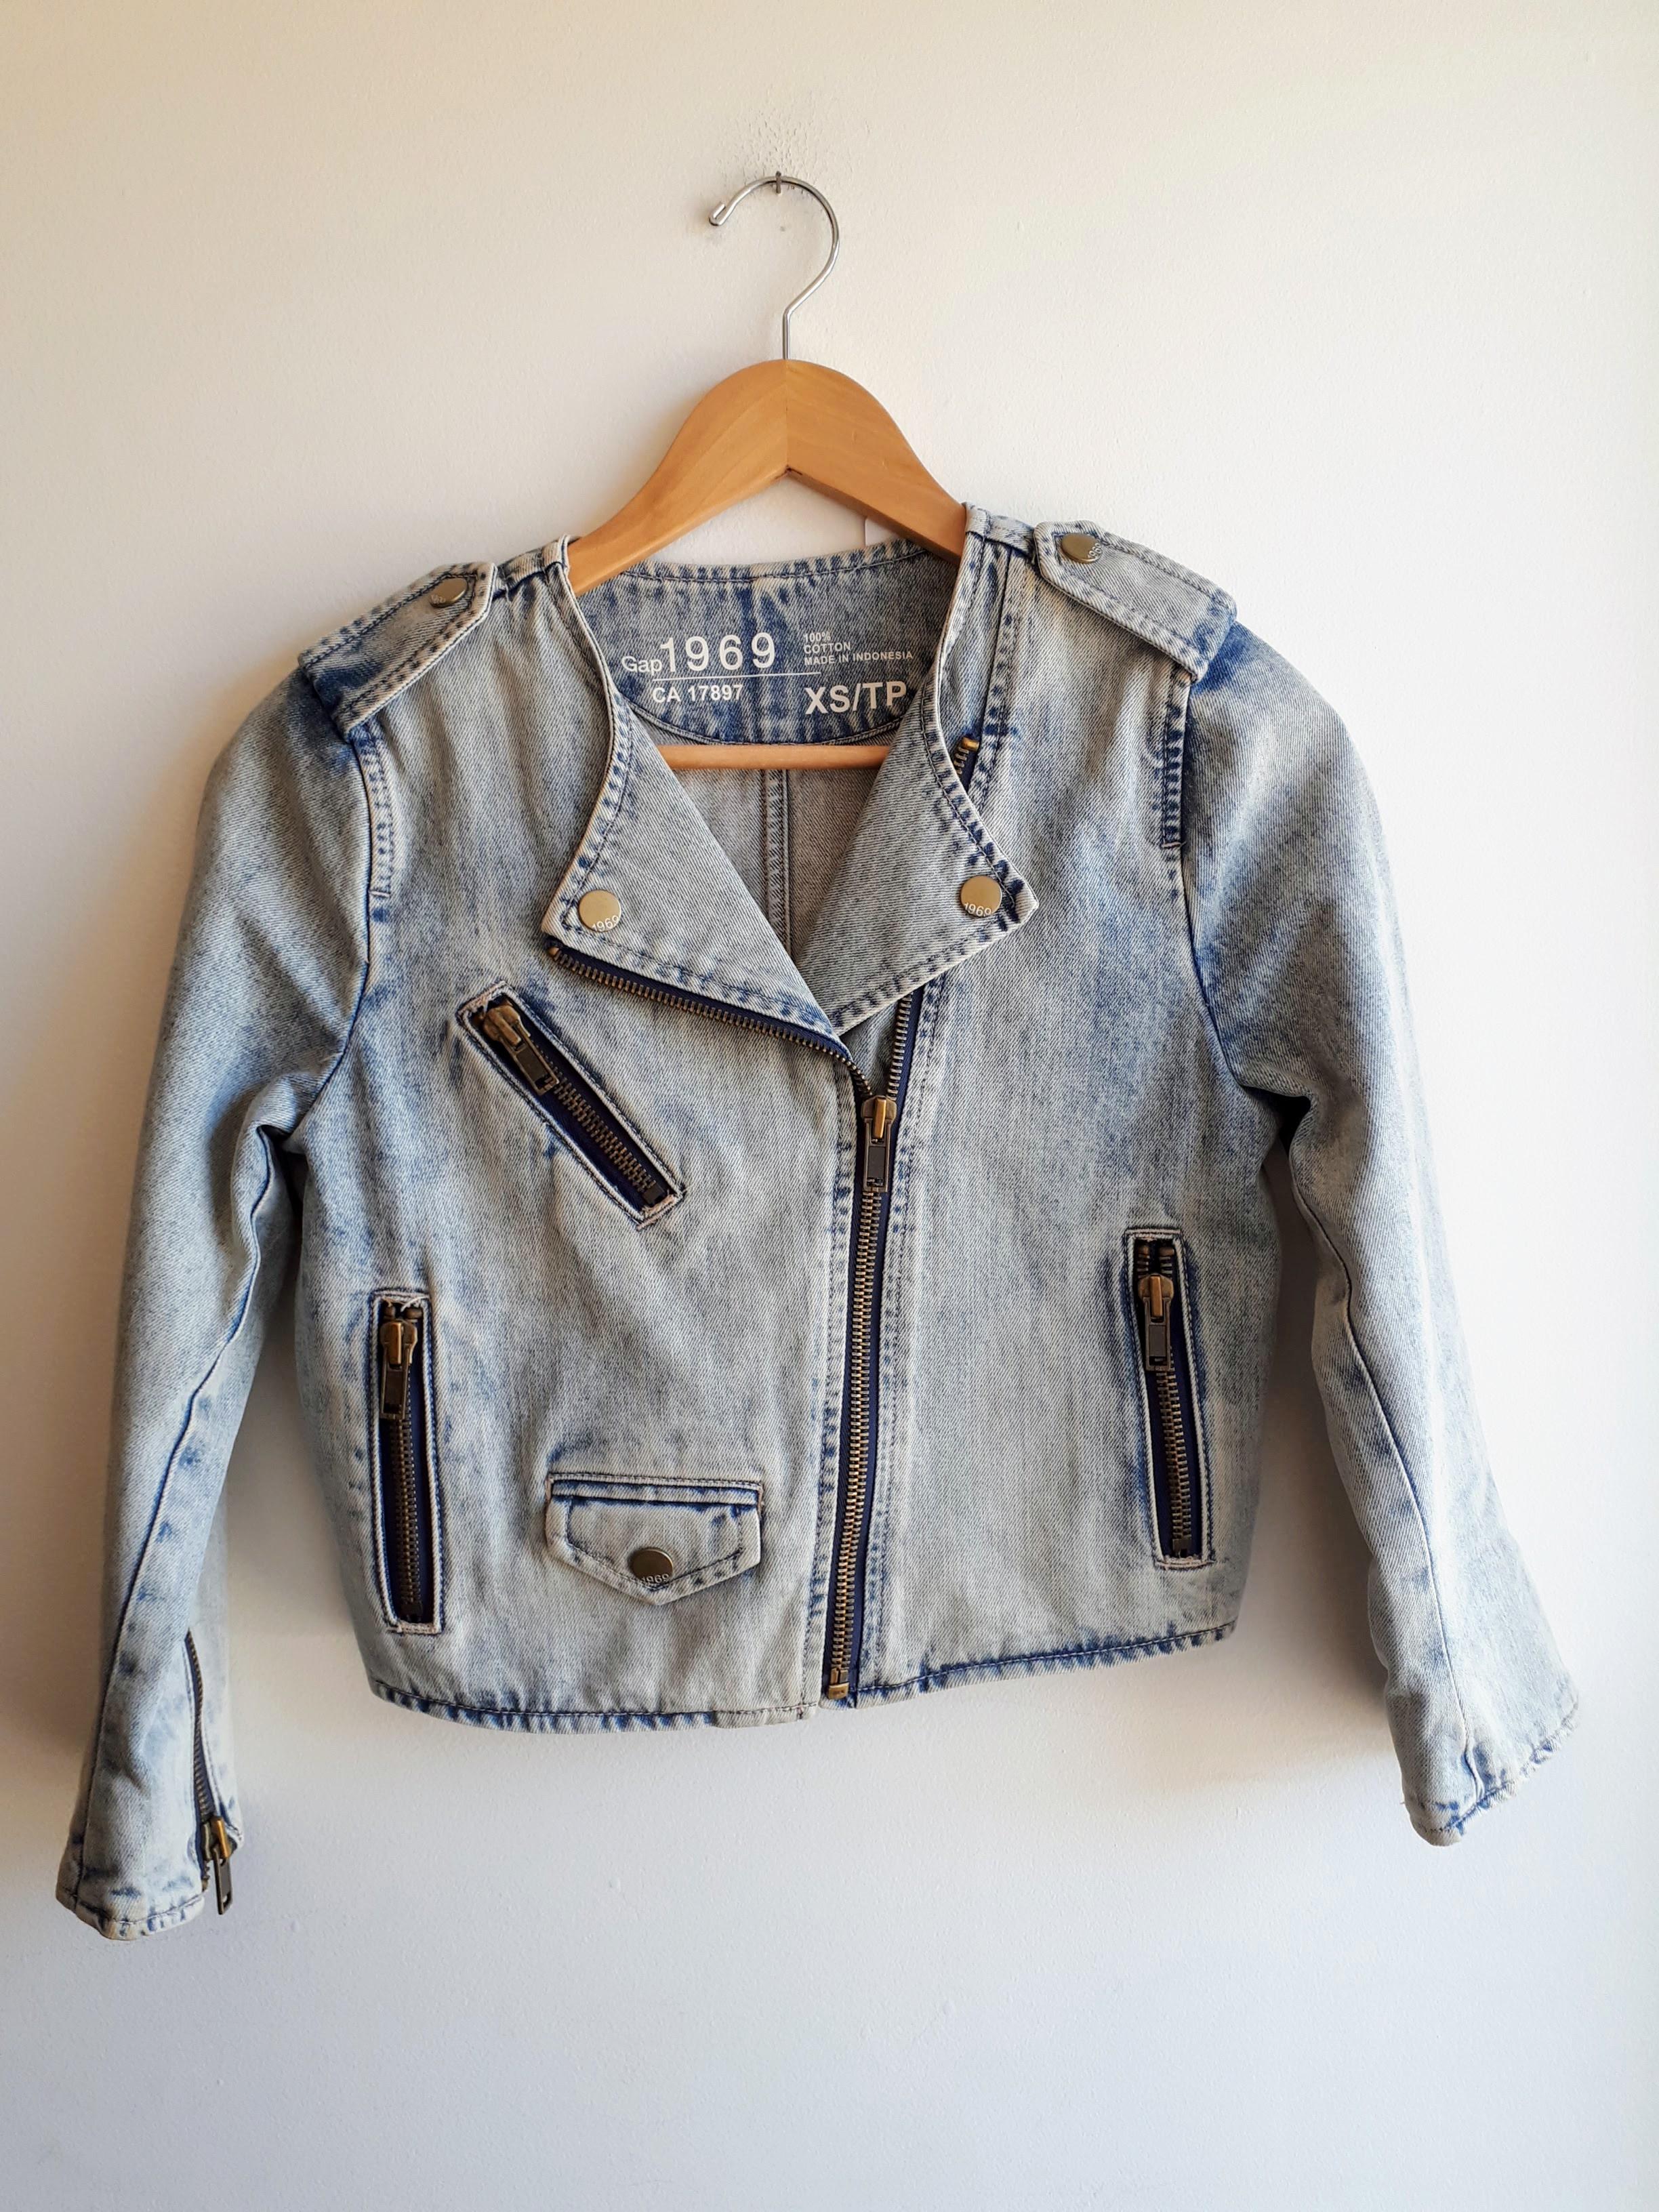 Gap jacket; Size XS, $42